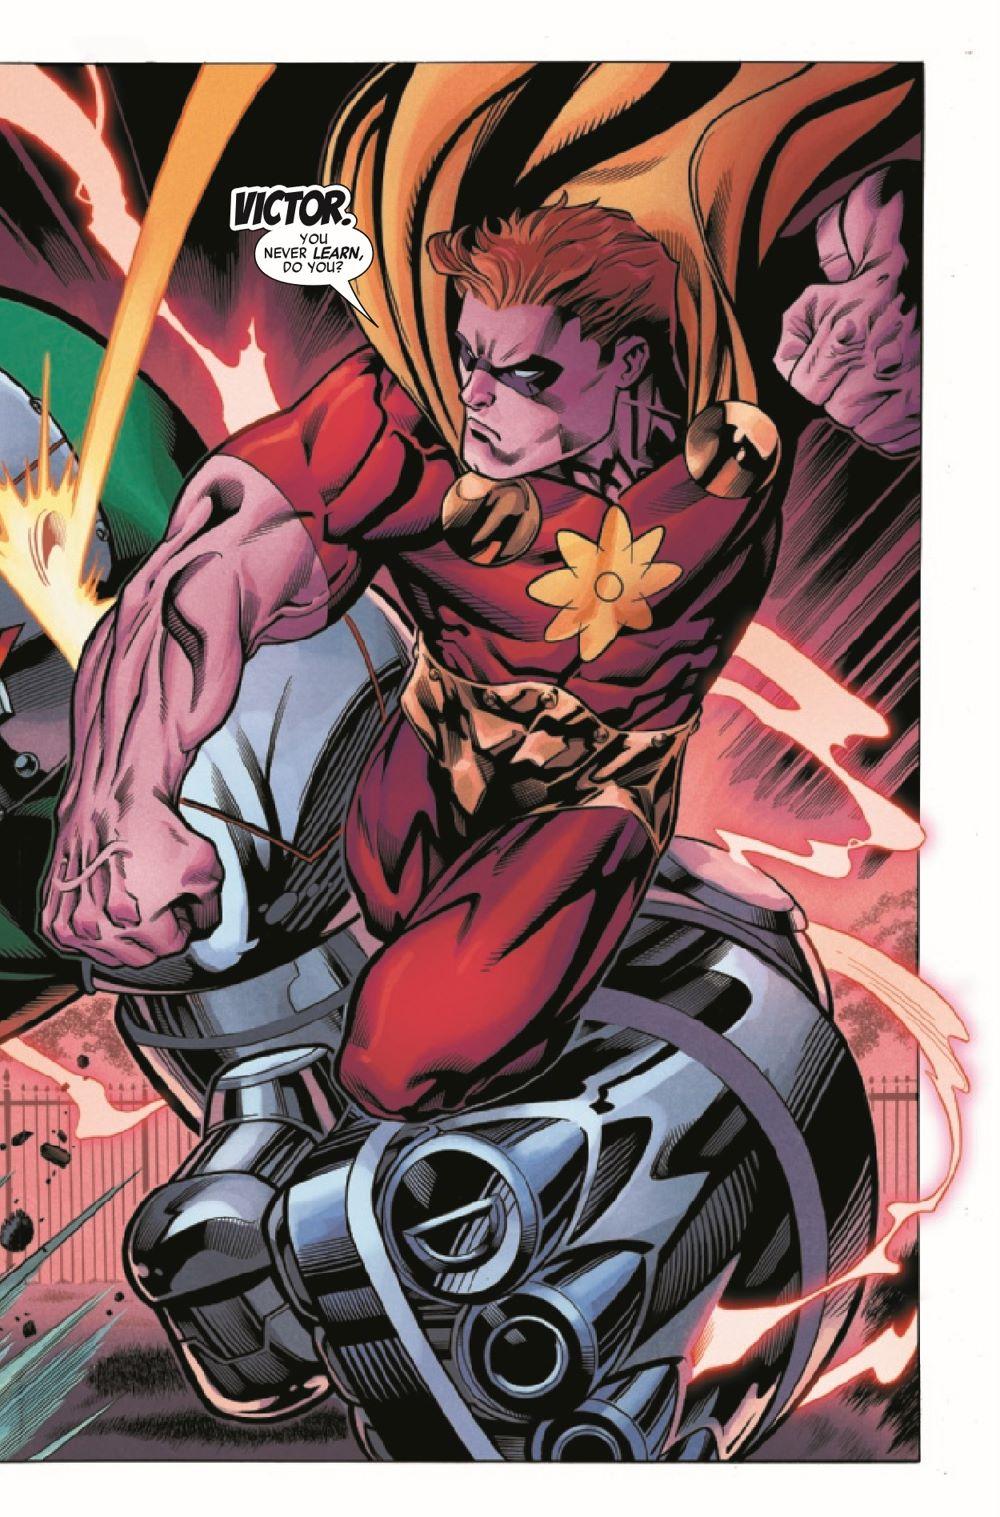 HEROESREBORN2021001_Preview-7 ComicList Previews: HEROES REBORN #1 (OF 7)